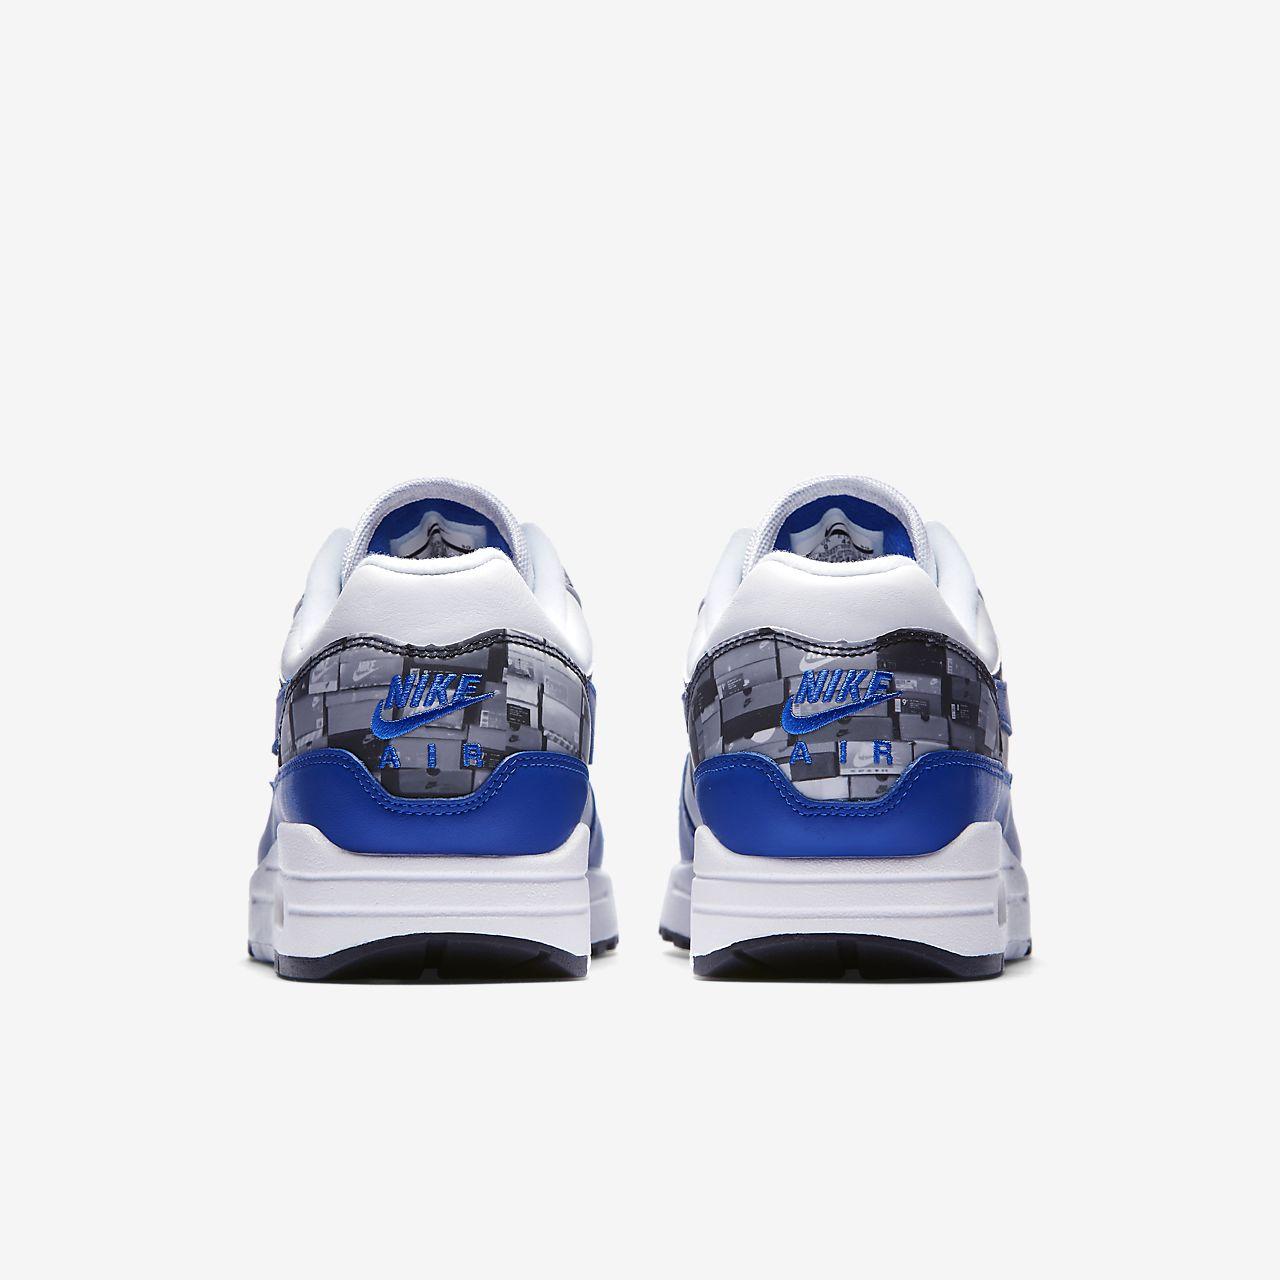 Nike Print 1 Men's Shoe Air Max KJFc3Tl1